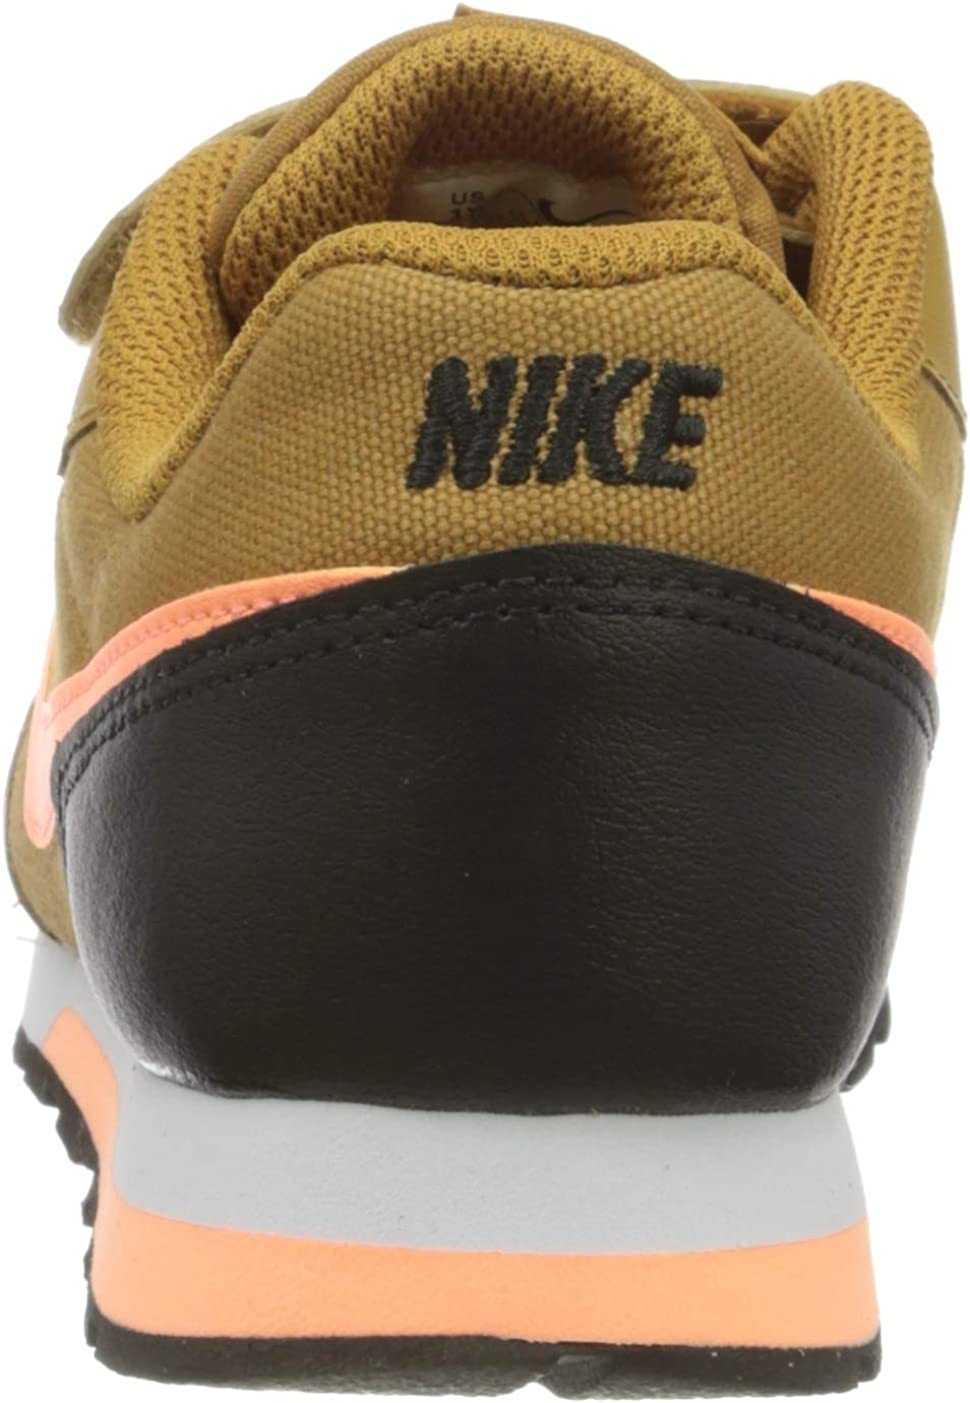 Scarpe da Ginnastica Bambino PSV Nike MD Runner 2